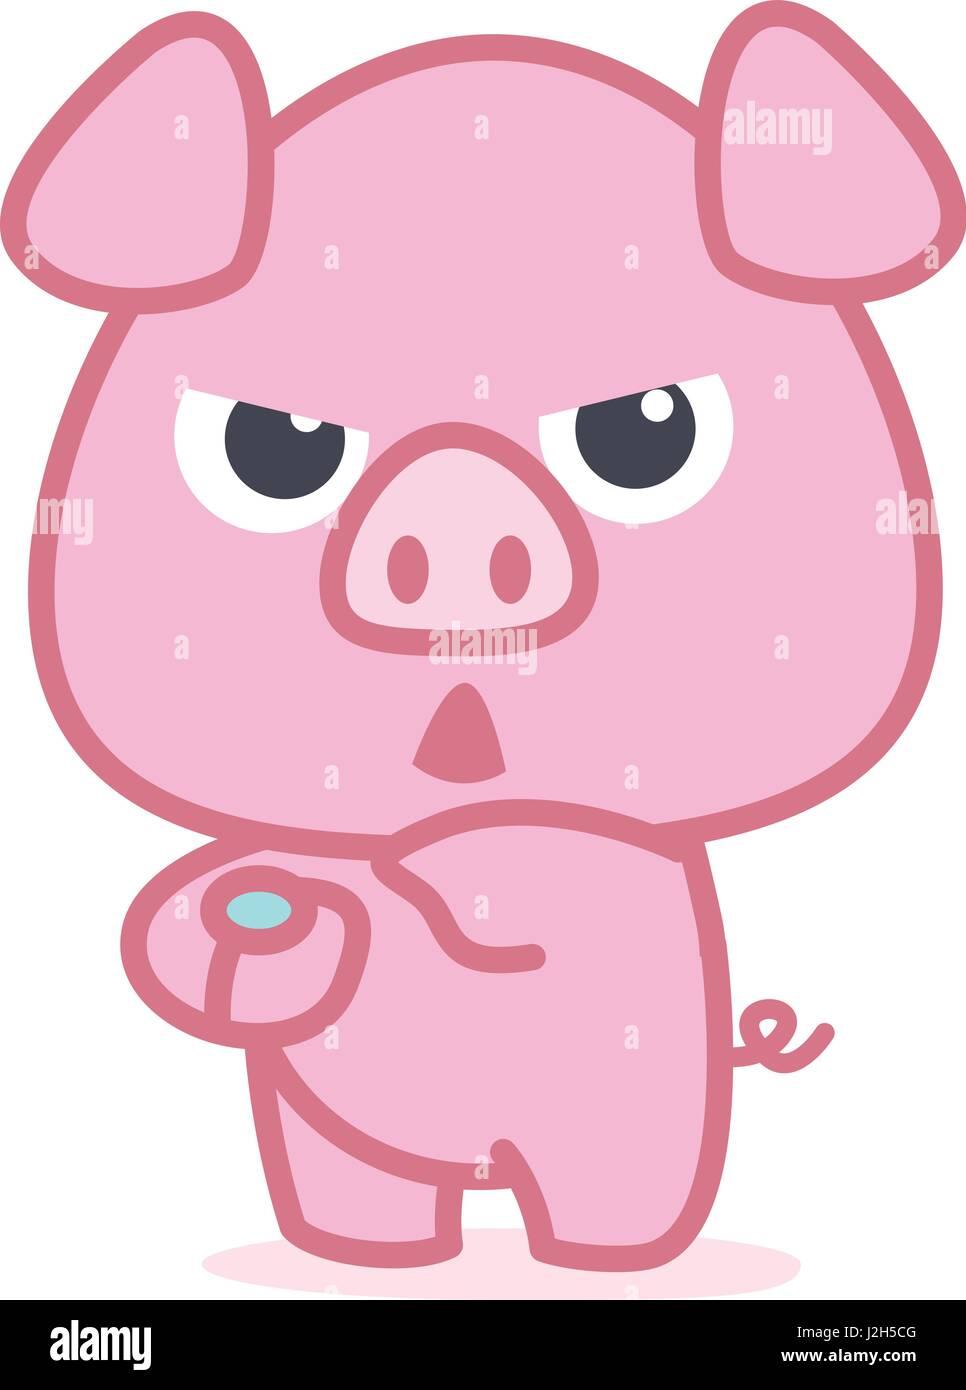 character of pink pig cartoon stock vector art illustration